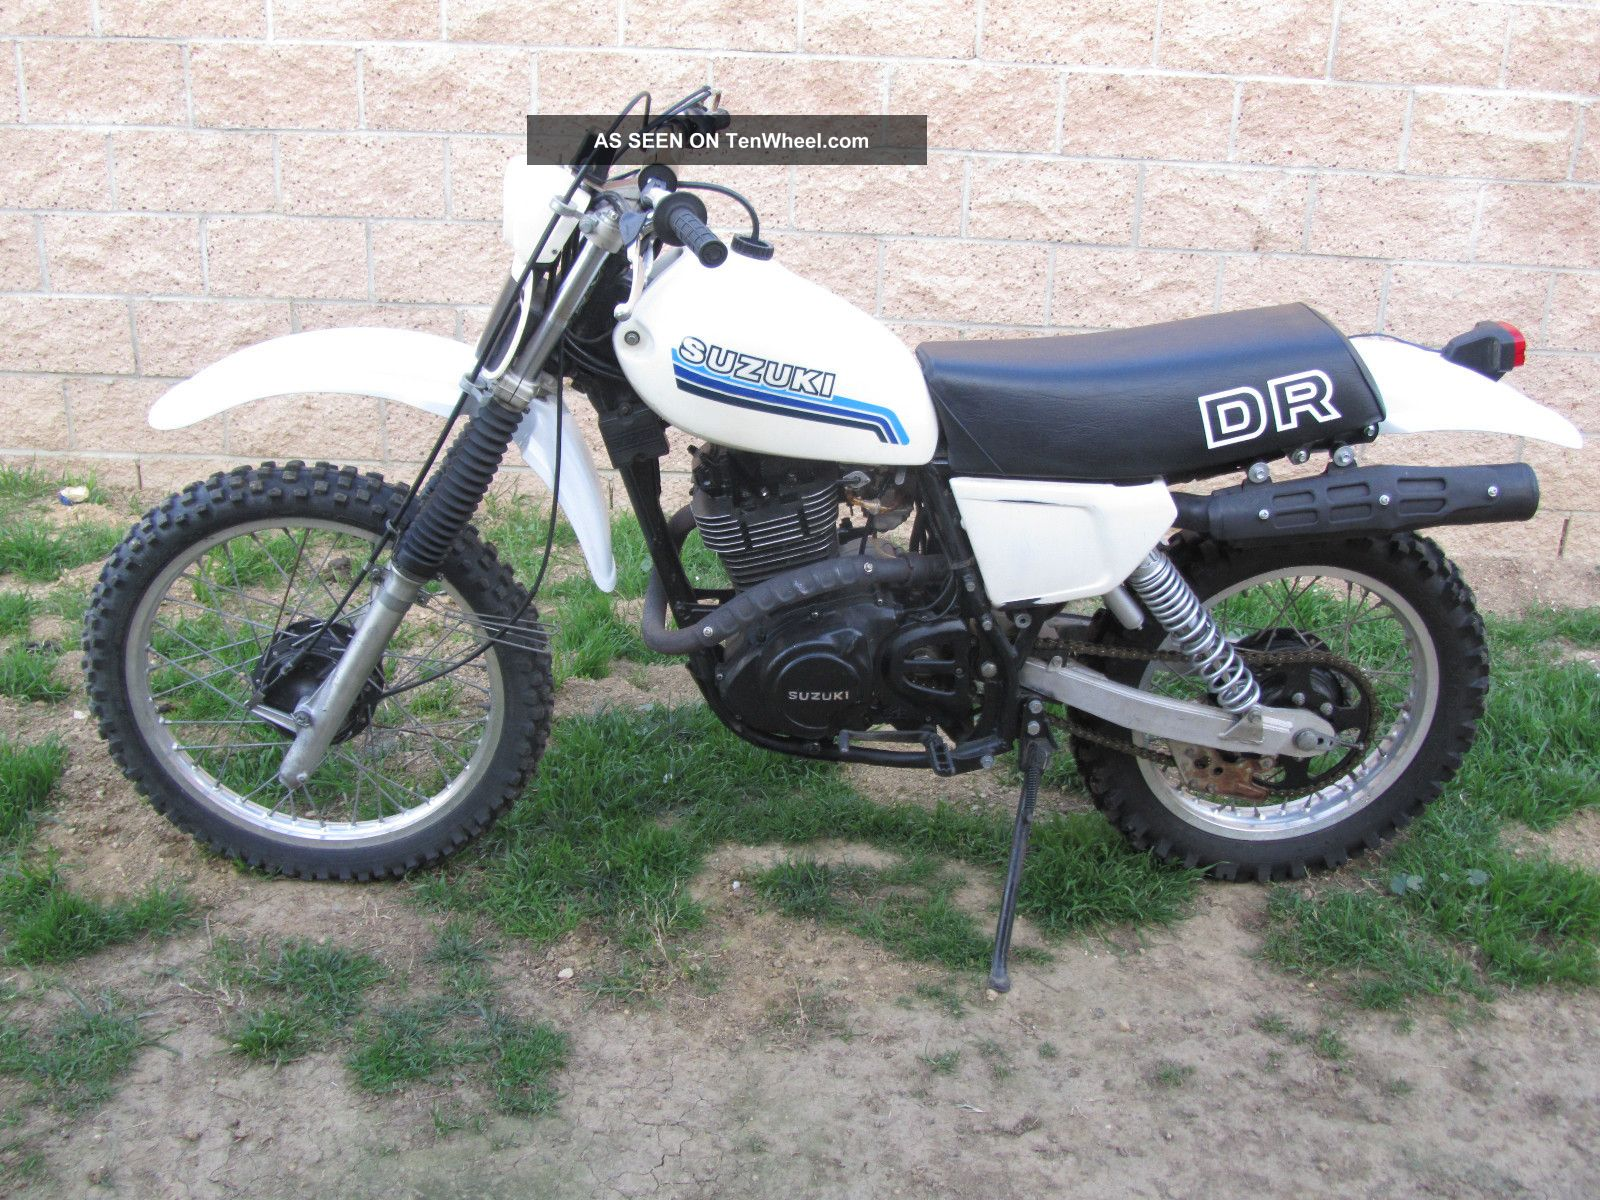 Watch additionally 1981 Yamaha Xj 400 Seca furthermore Reader Rides Daves 1981 Honda Cb750 Bobber as well Honda Cx 500 Cafe Racer 2 also Yamaha Custom Motorcycles. on 1981 yamaha 750 special